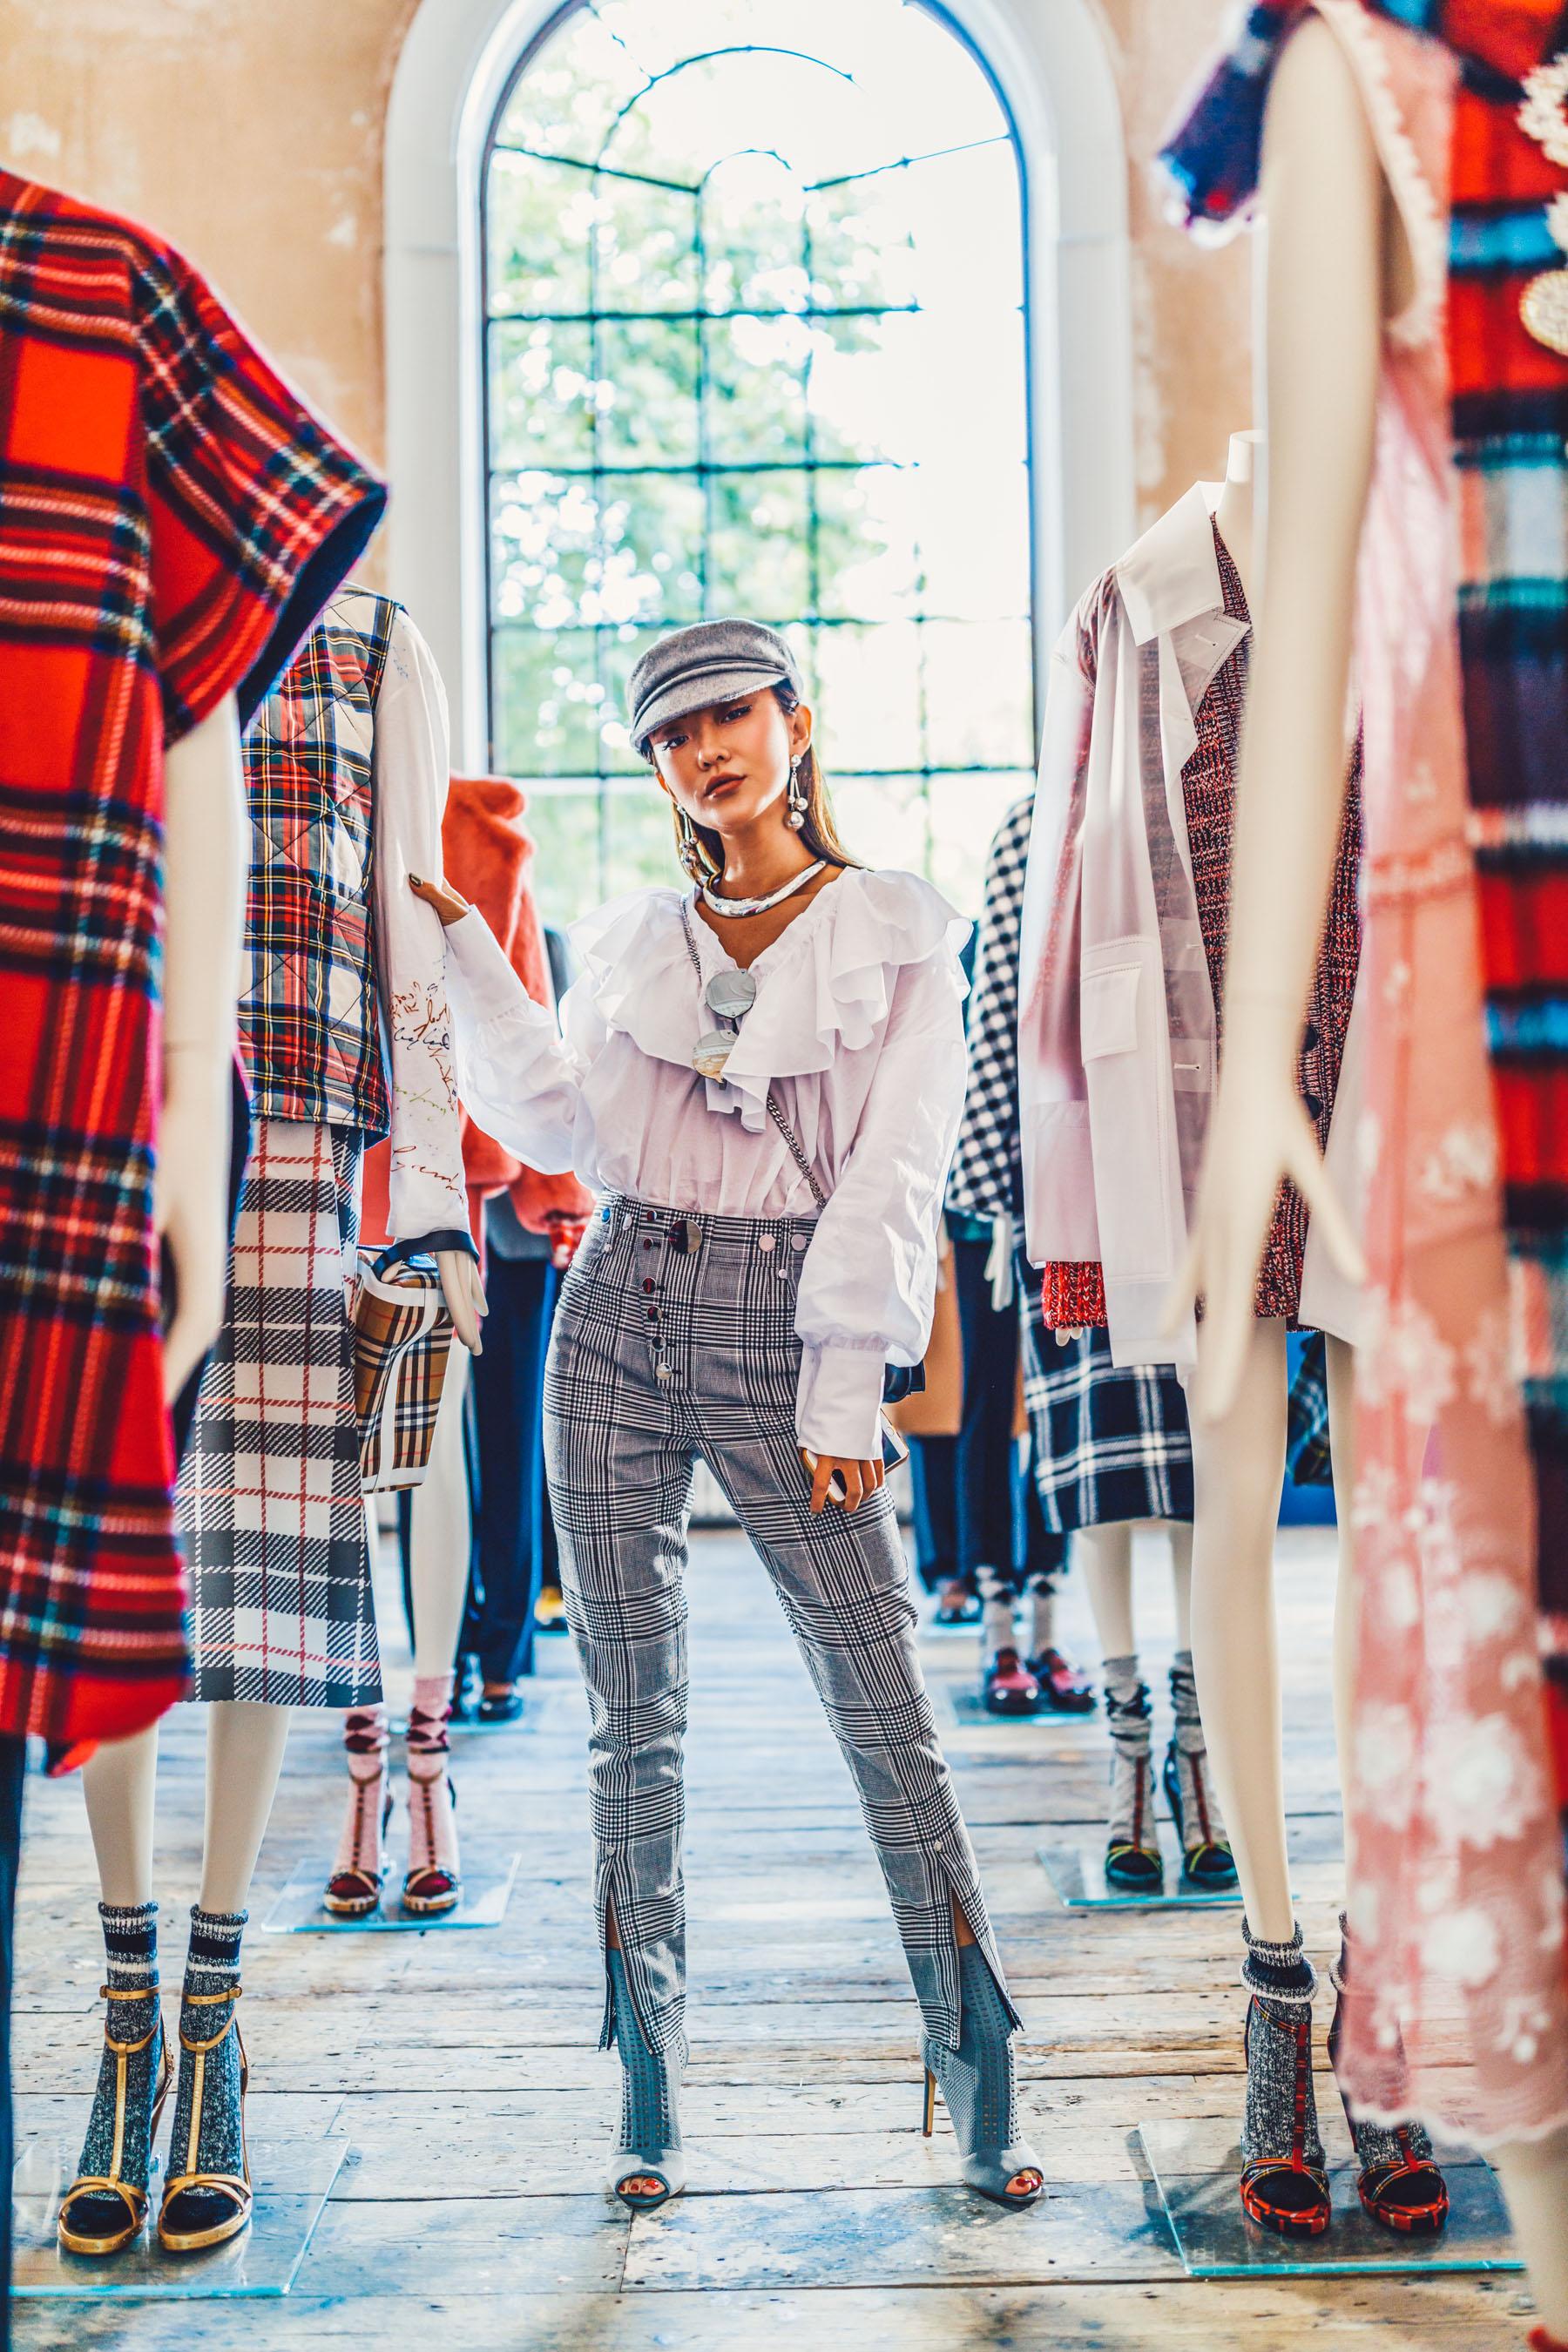 London Fashion Week Day 2 Street Style // NotJessFashion.com